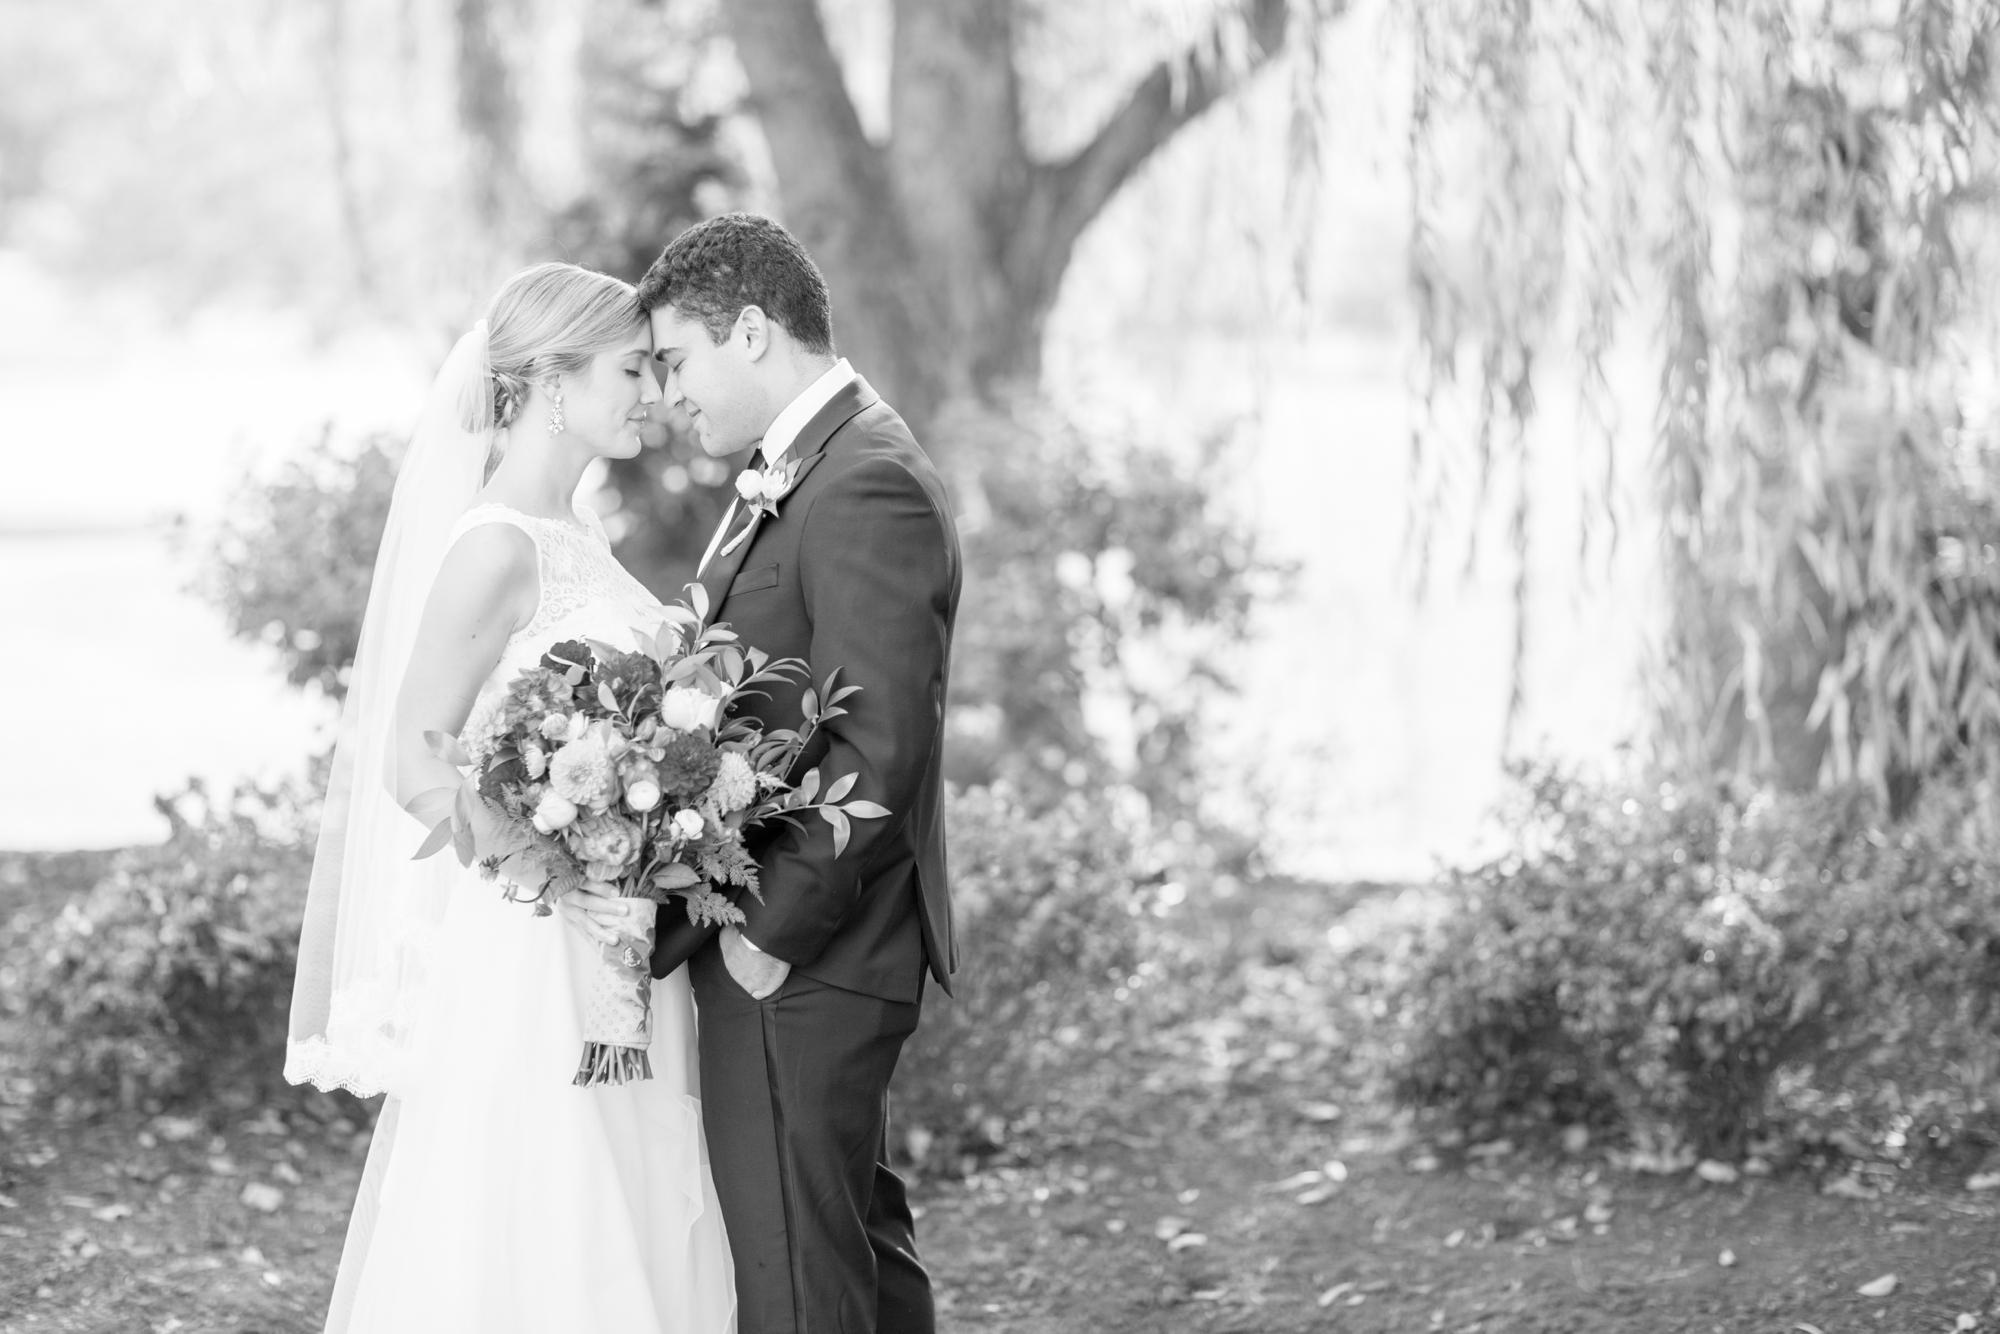 2-Finkel Wedding Bride & Groom Portraits-222_anna grace photography maryland wedding photographer turf valley.jpg